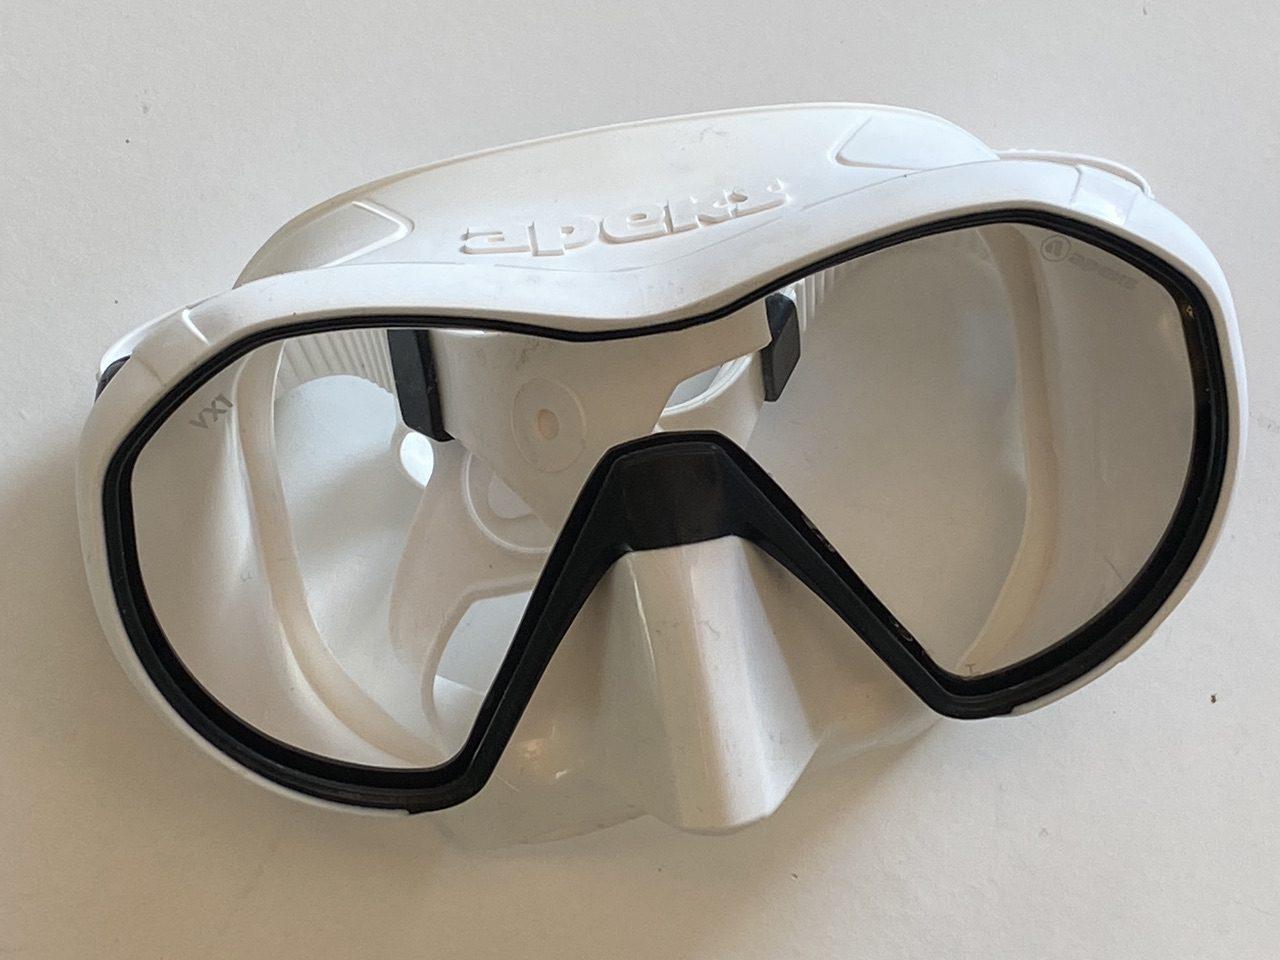 Scuba Masks: Apeks VX1 (SRP: £69.00)